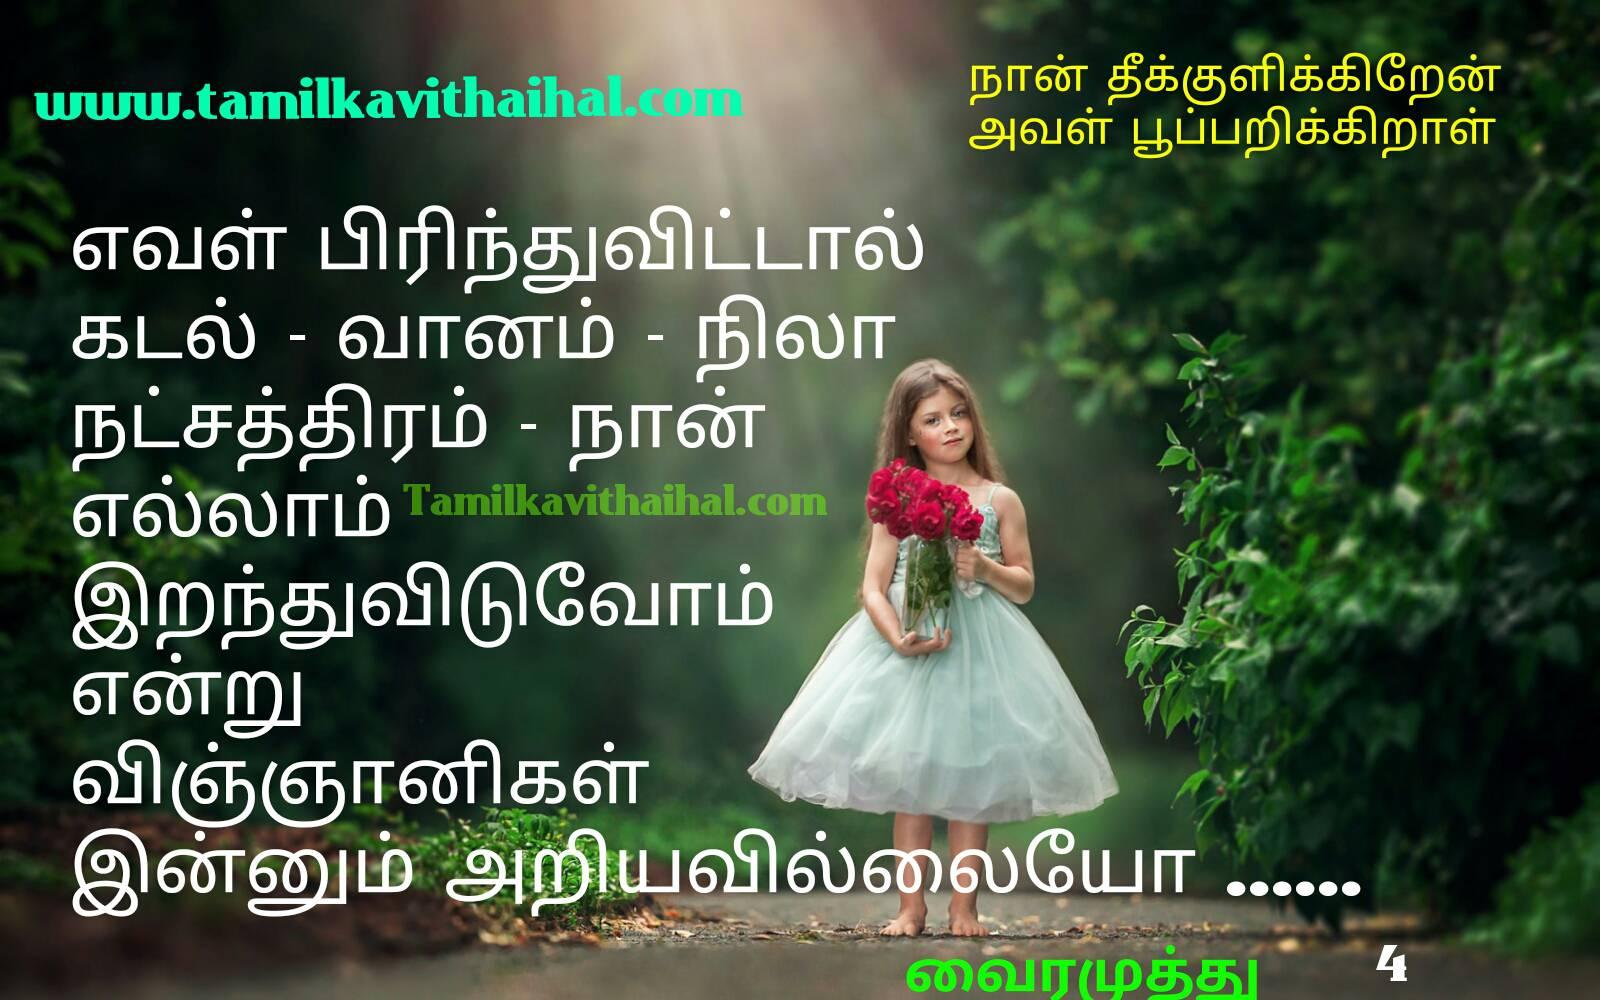 Beautiful vairamuthu tamil kavithaigal naan thekkulikiren aval pooparikiraal books love story boy emotional feel image 4